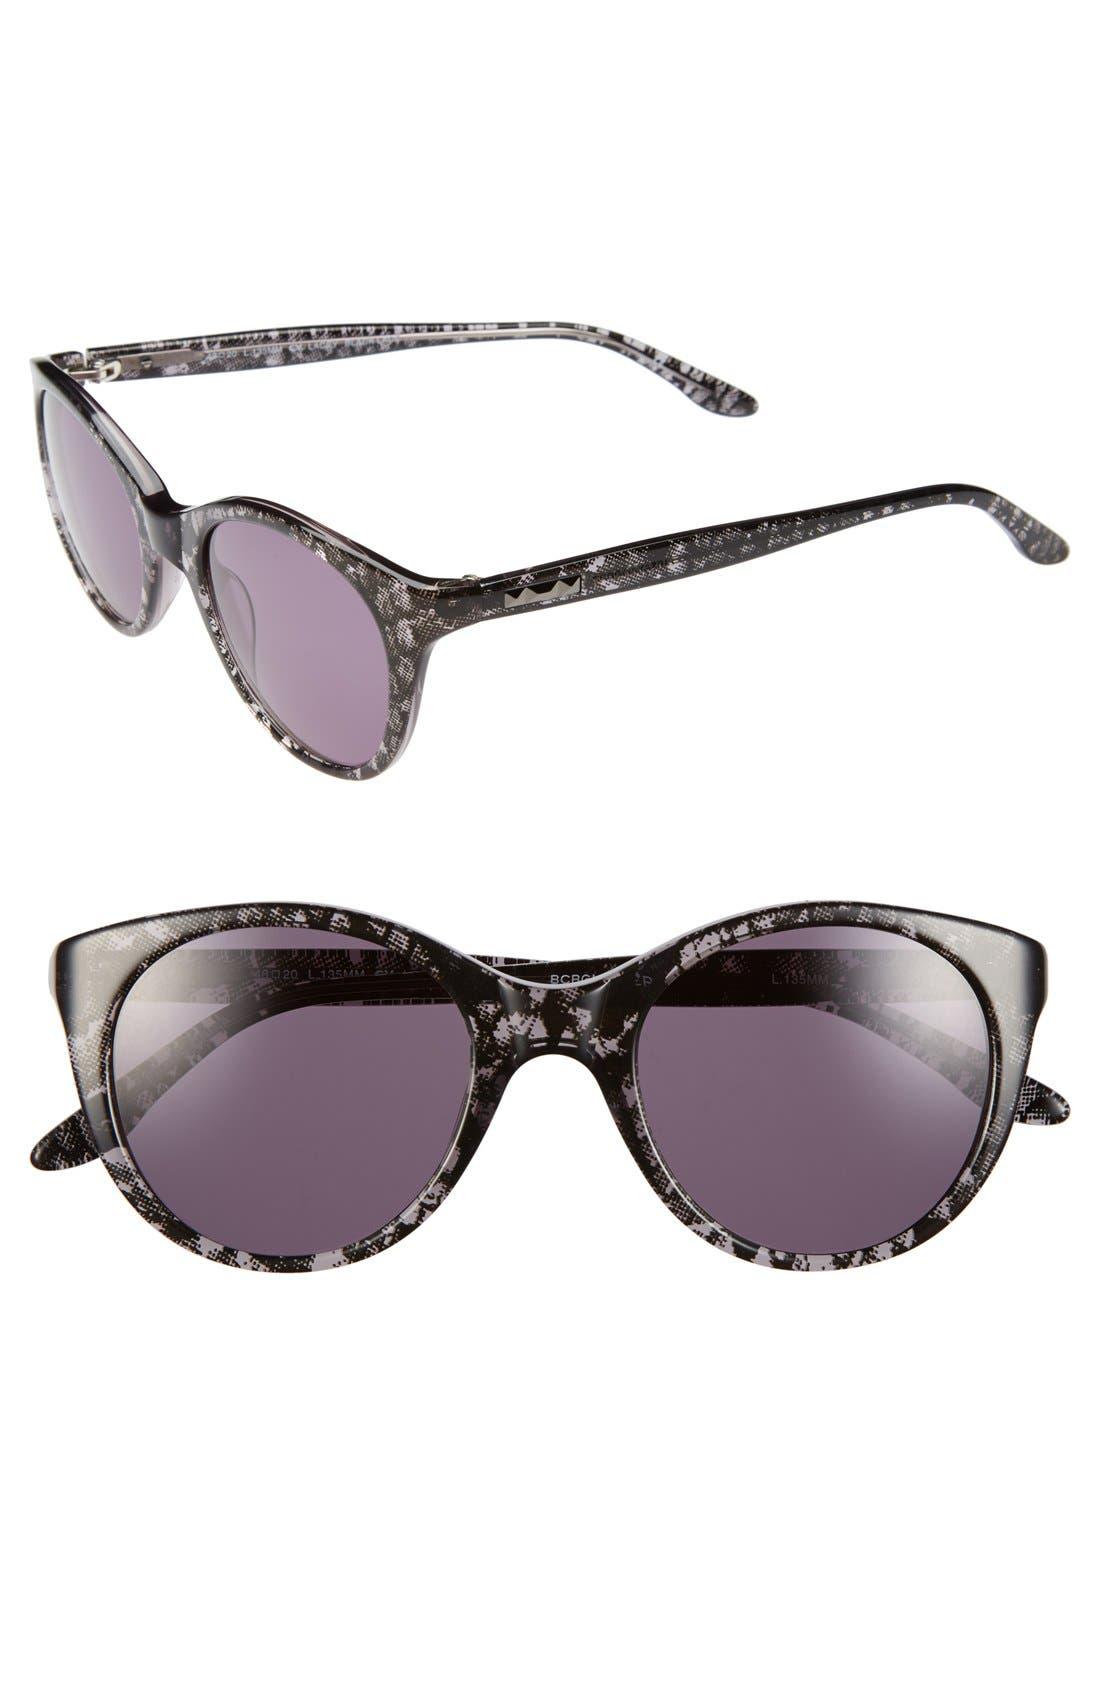 Main Image - BCBGMAXAZRIA 'Lacey' 48mm Sunglasses